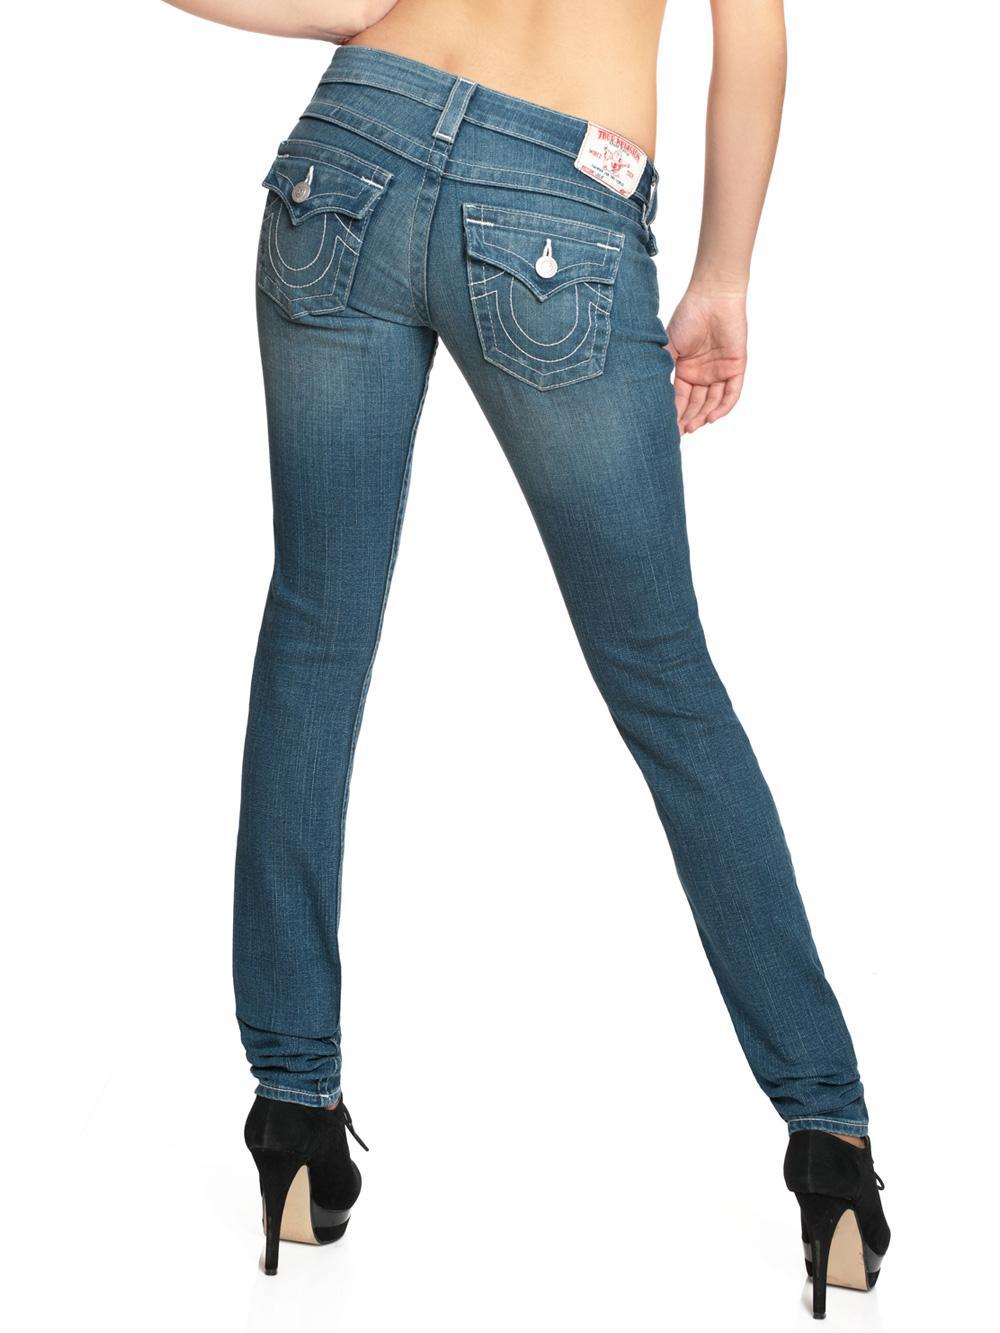 true religion damen jeans julie super t pictures to pin on pinterest. Black Bedroom Furniture Sets. Home Design Ideas